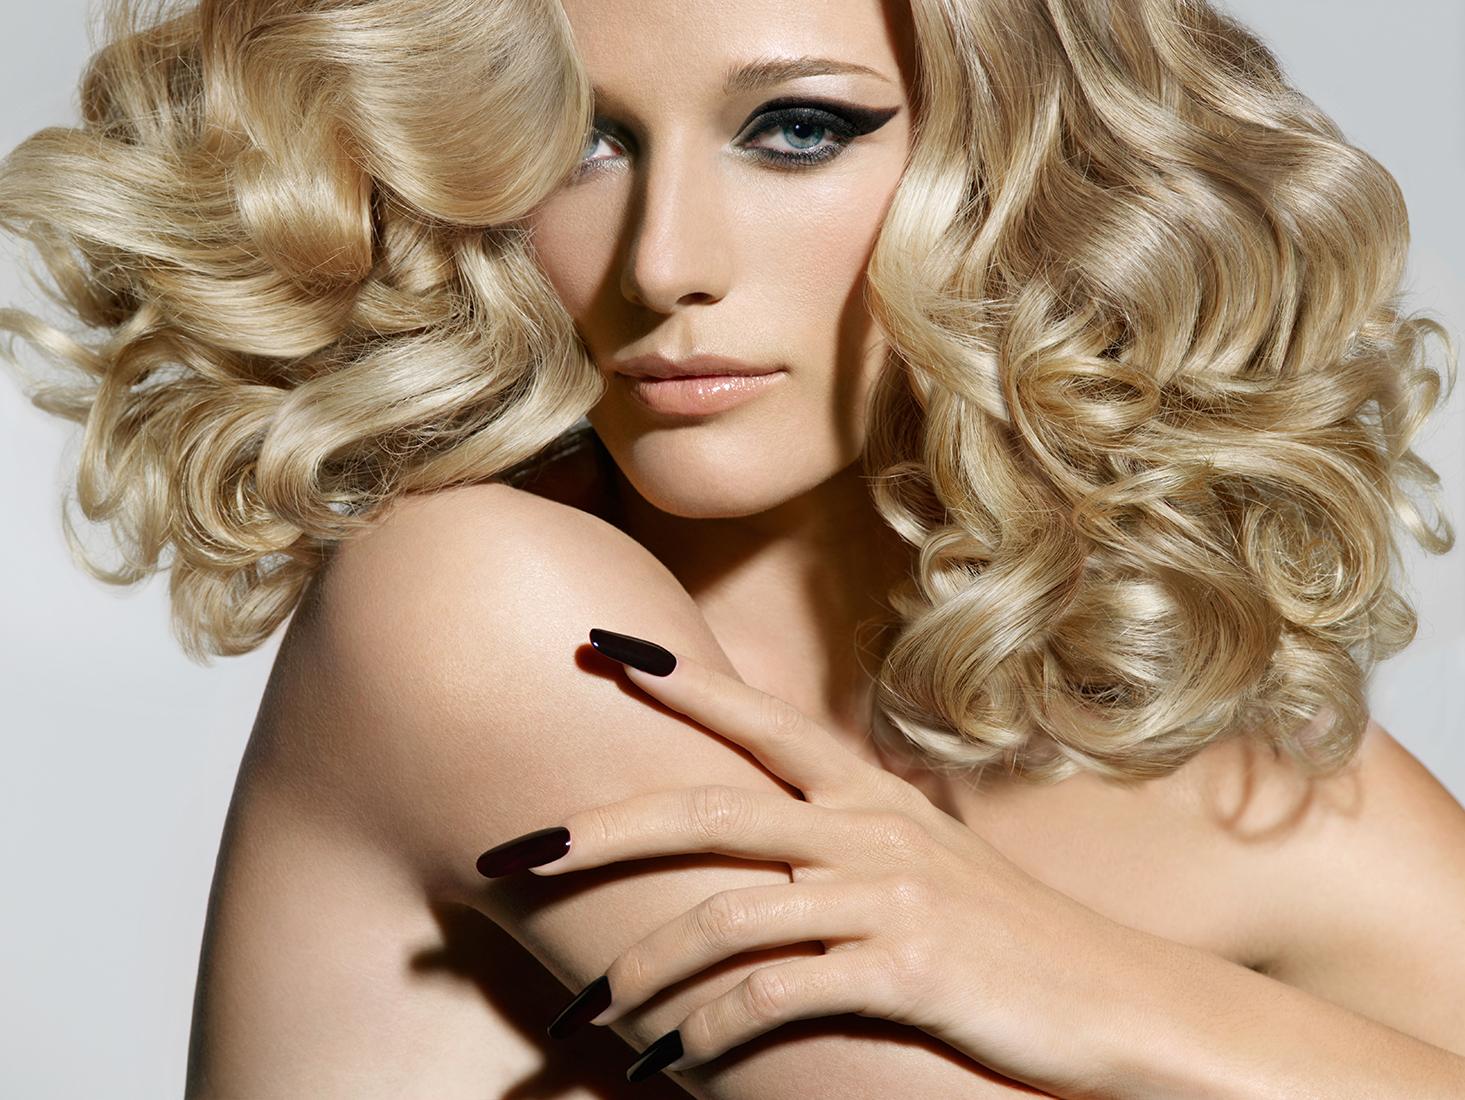 Still Photography - Beauty and Hair